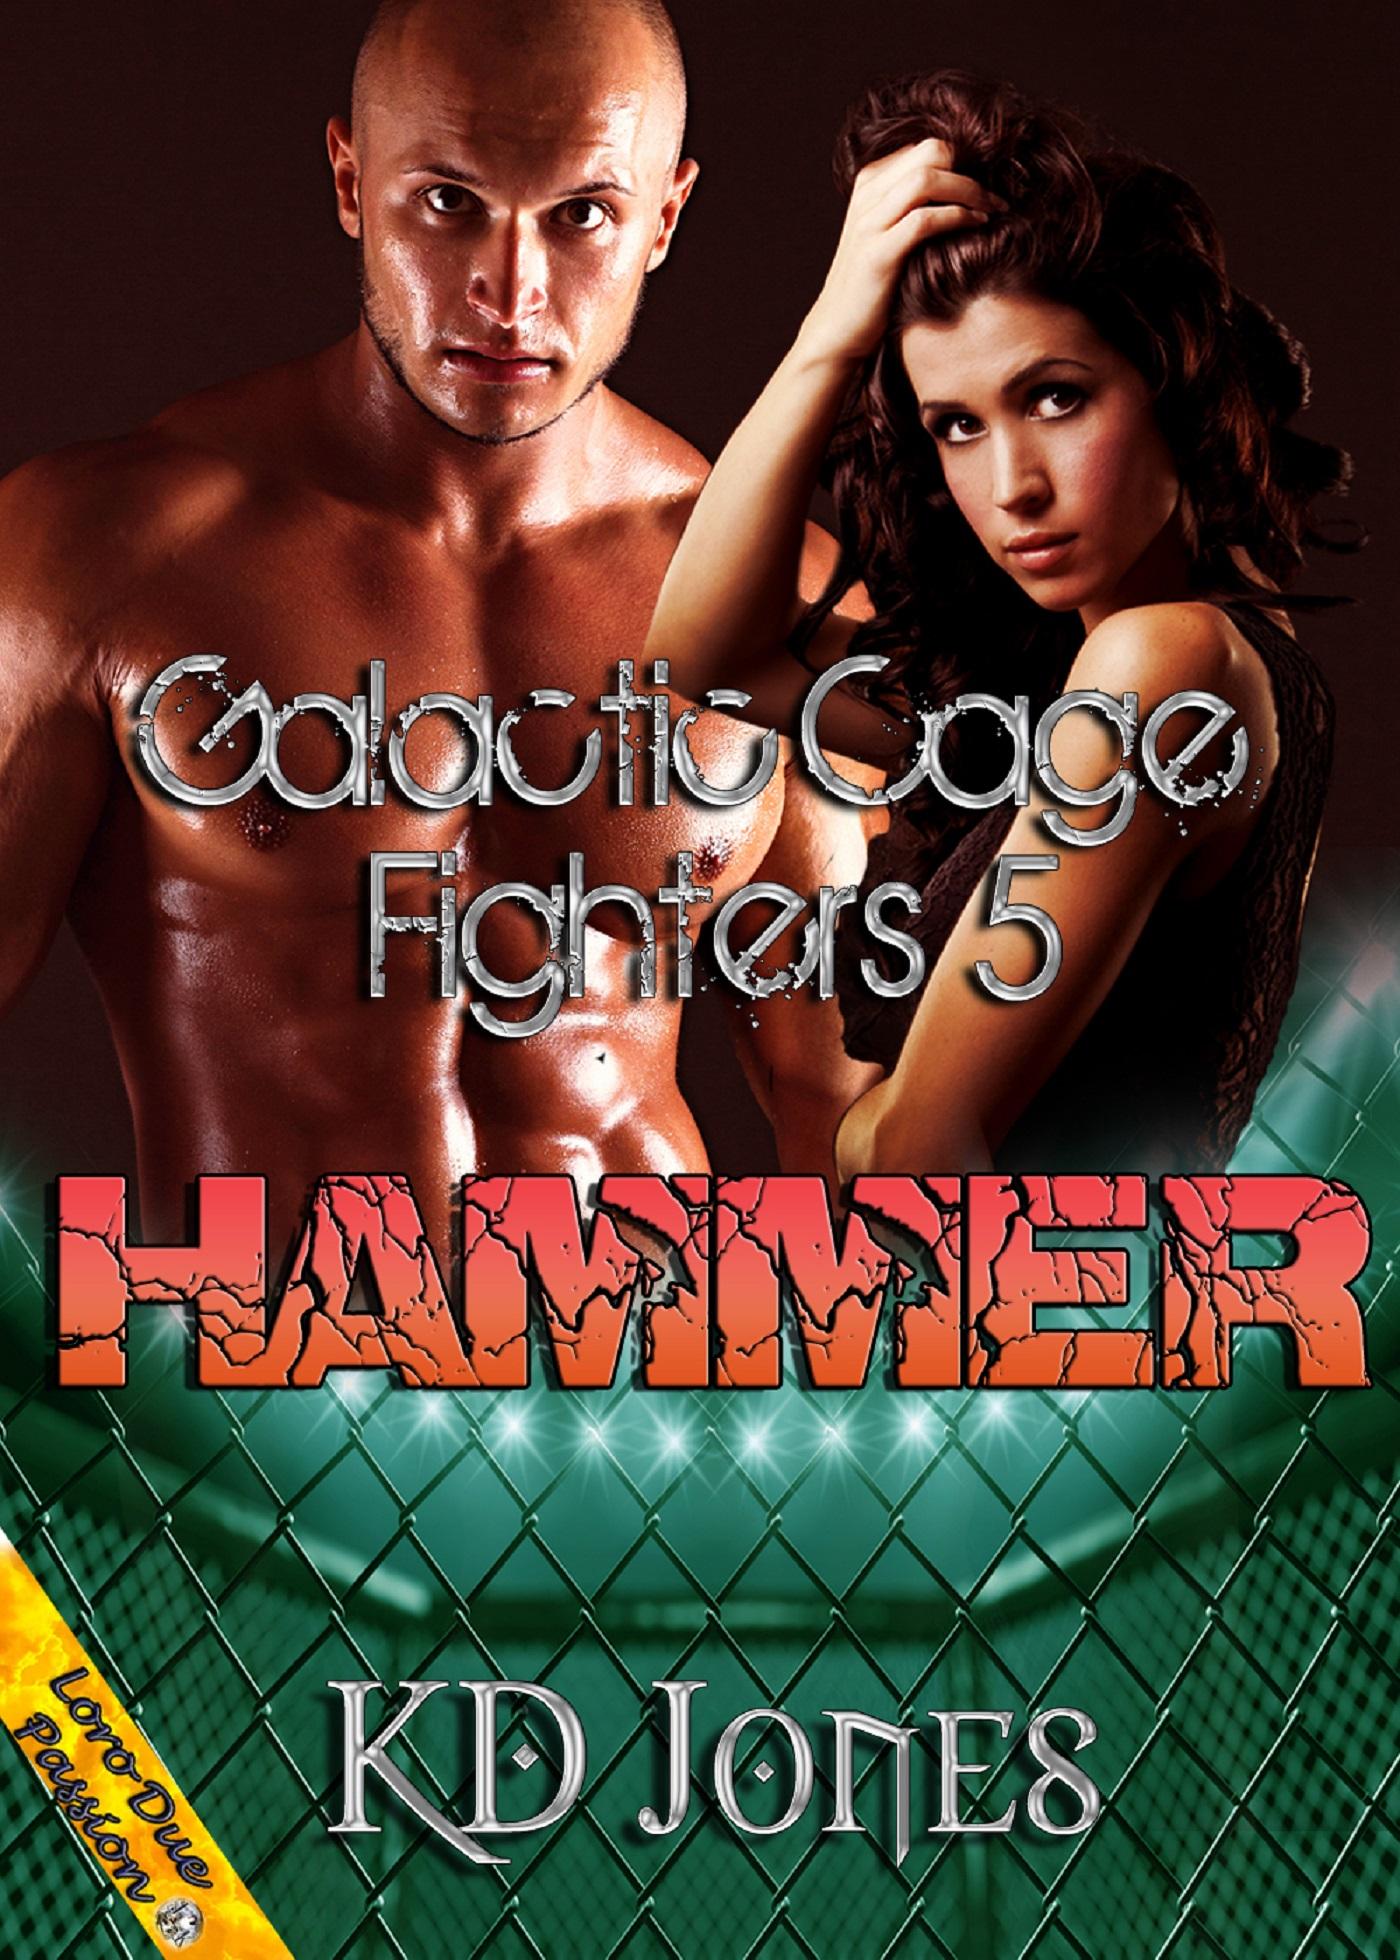 K.D. Jones - Hammer